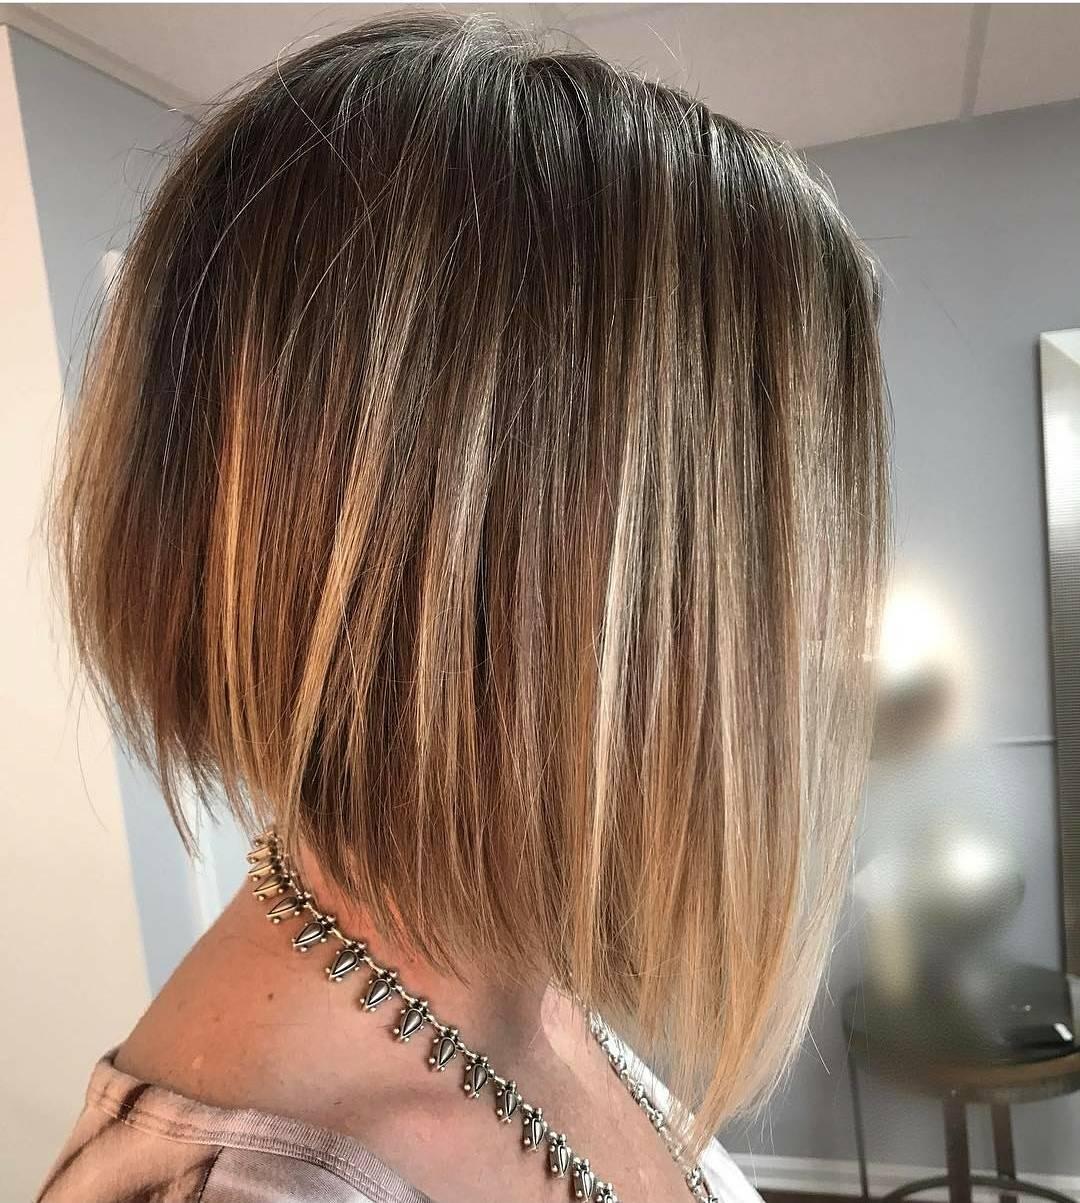 10 flattering short straight hairstyles, 2018 latest short haircut